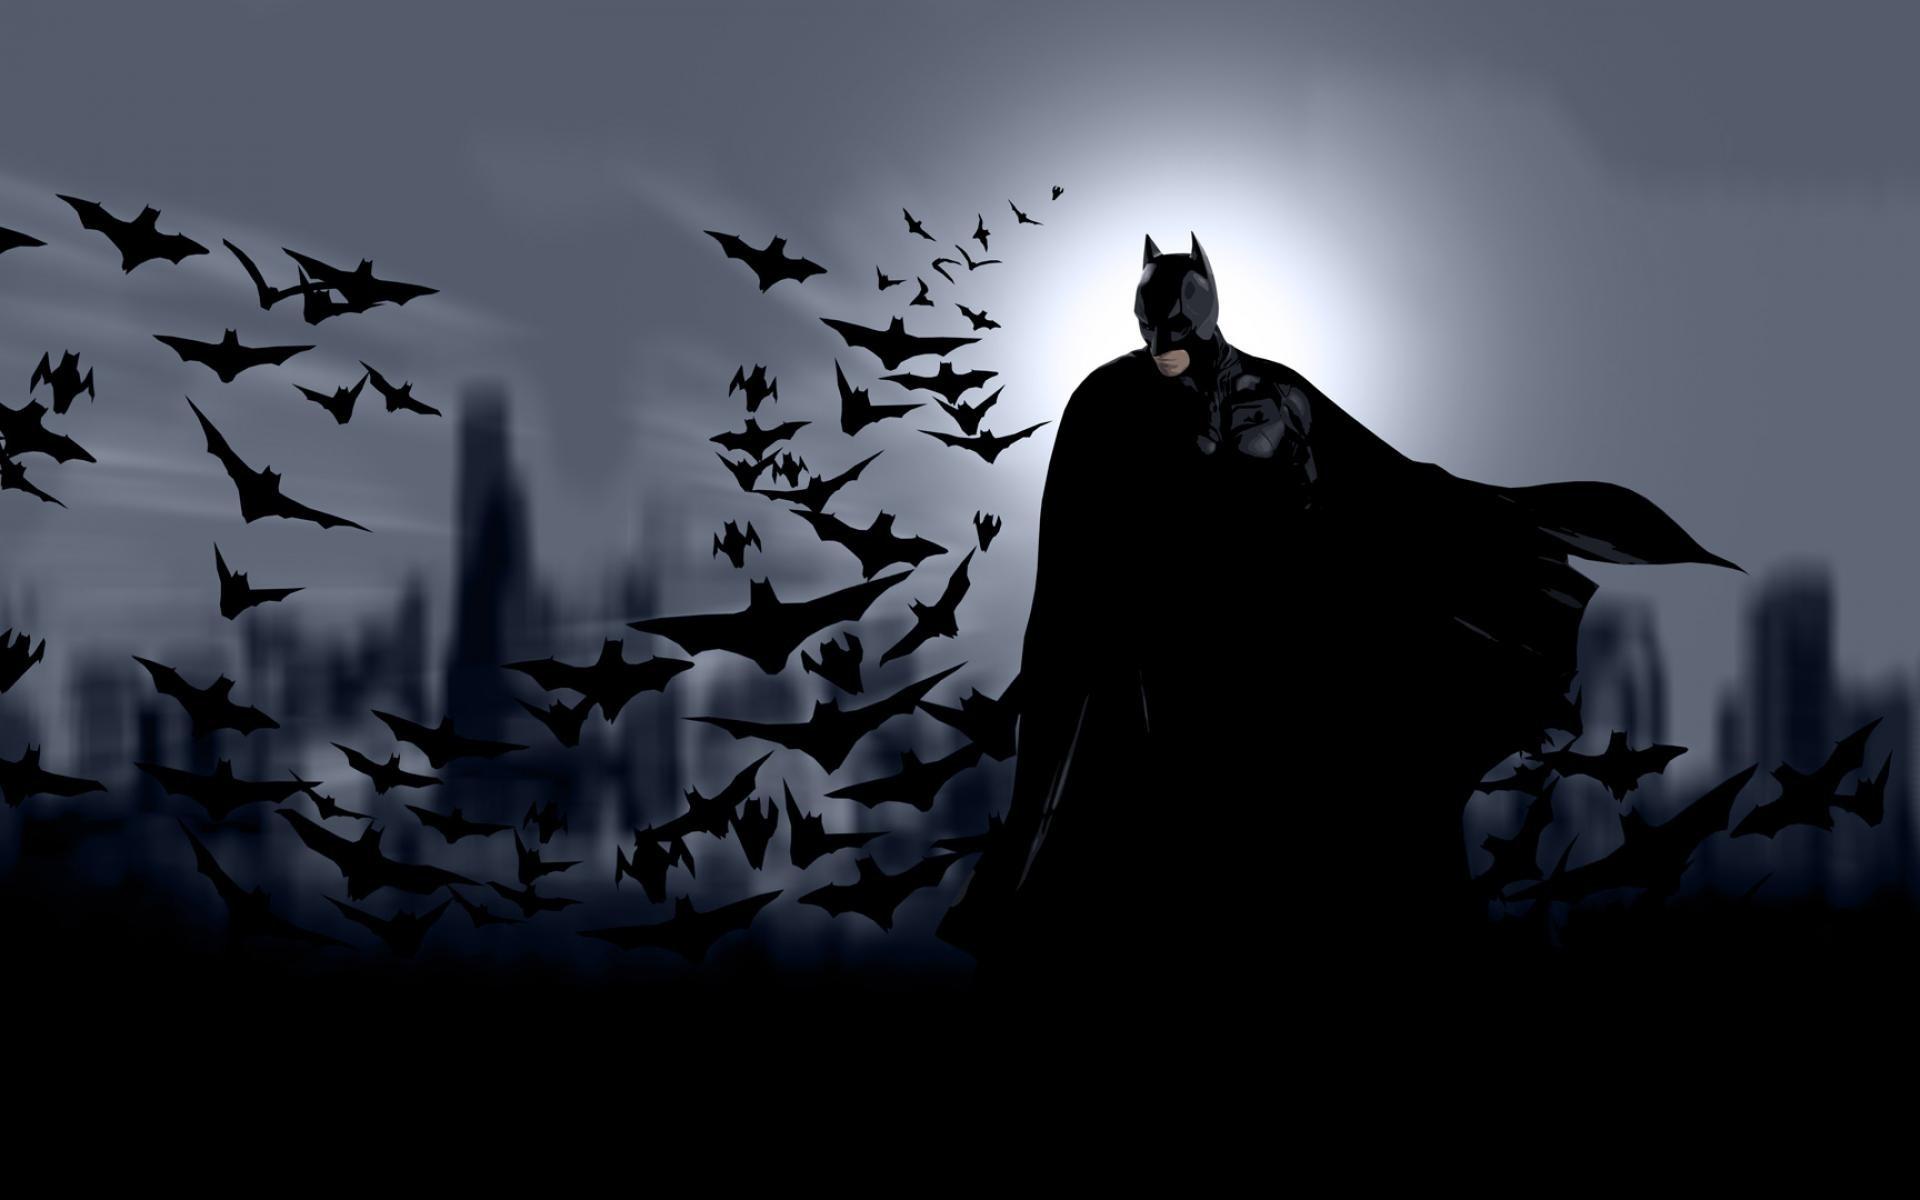 Batman Wallpapers Free Download